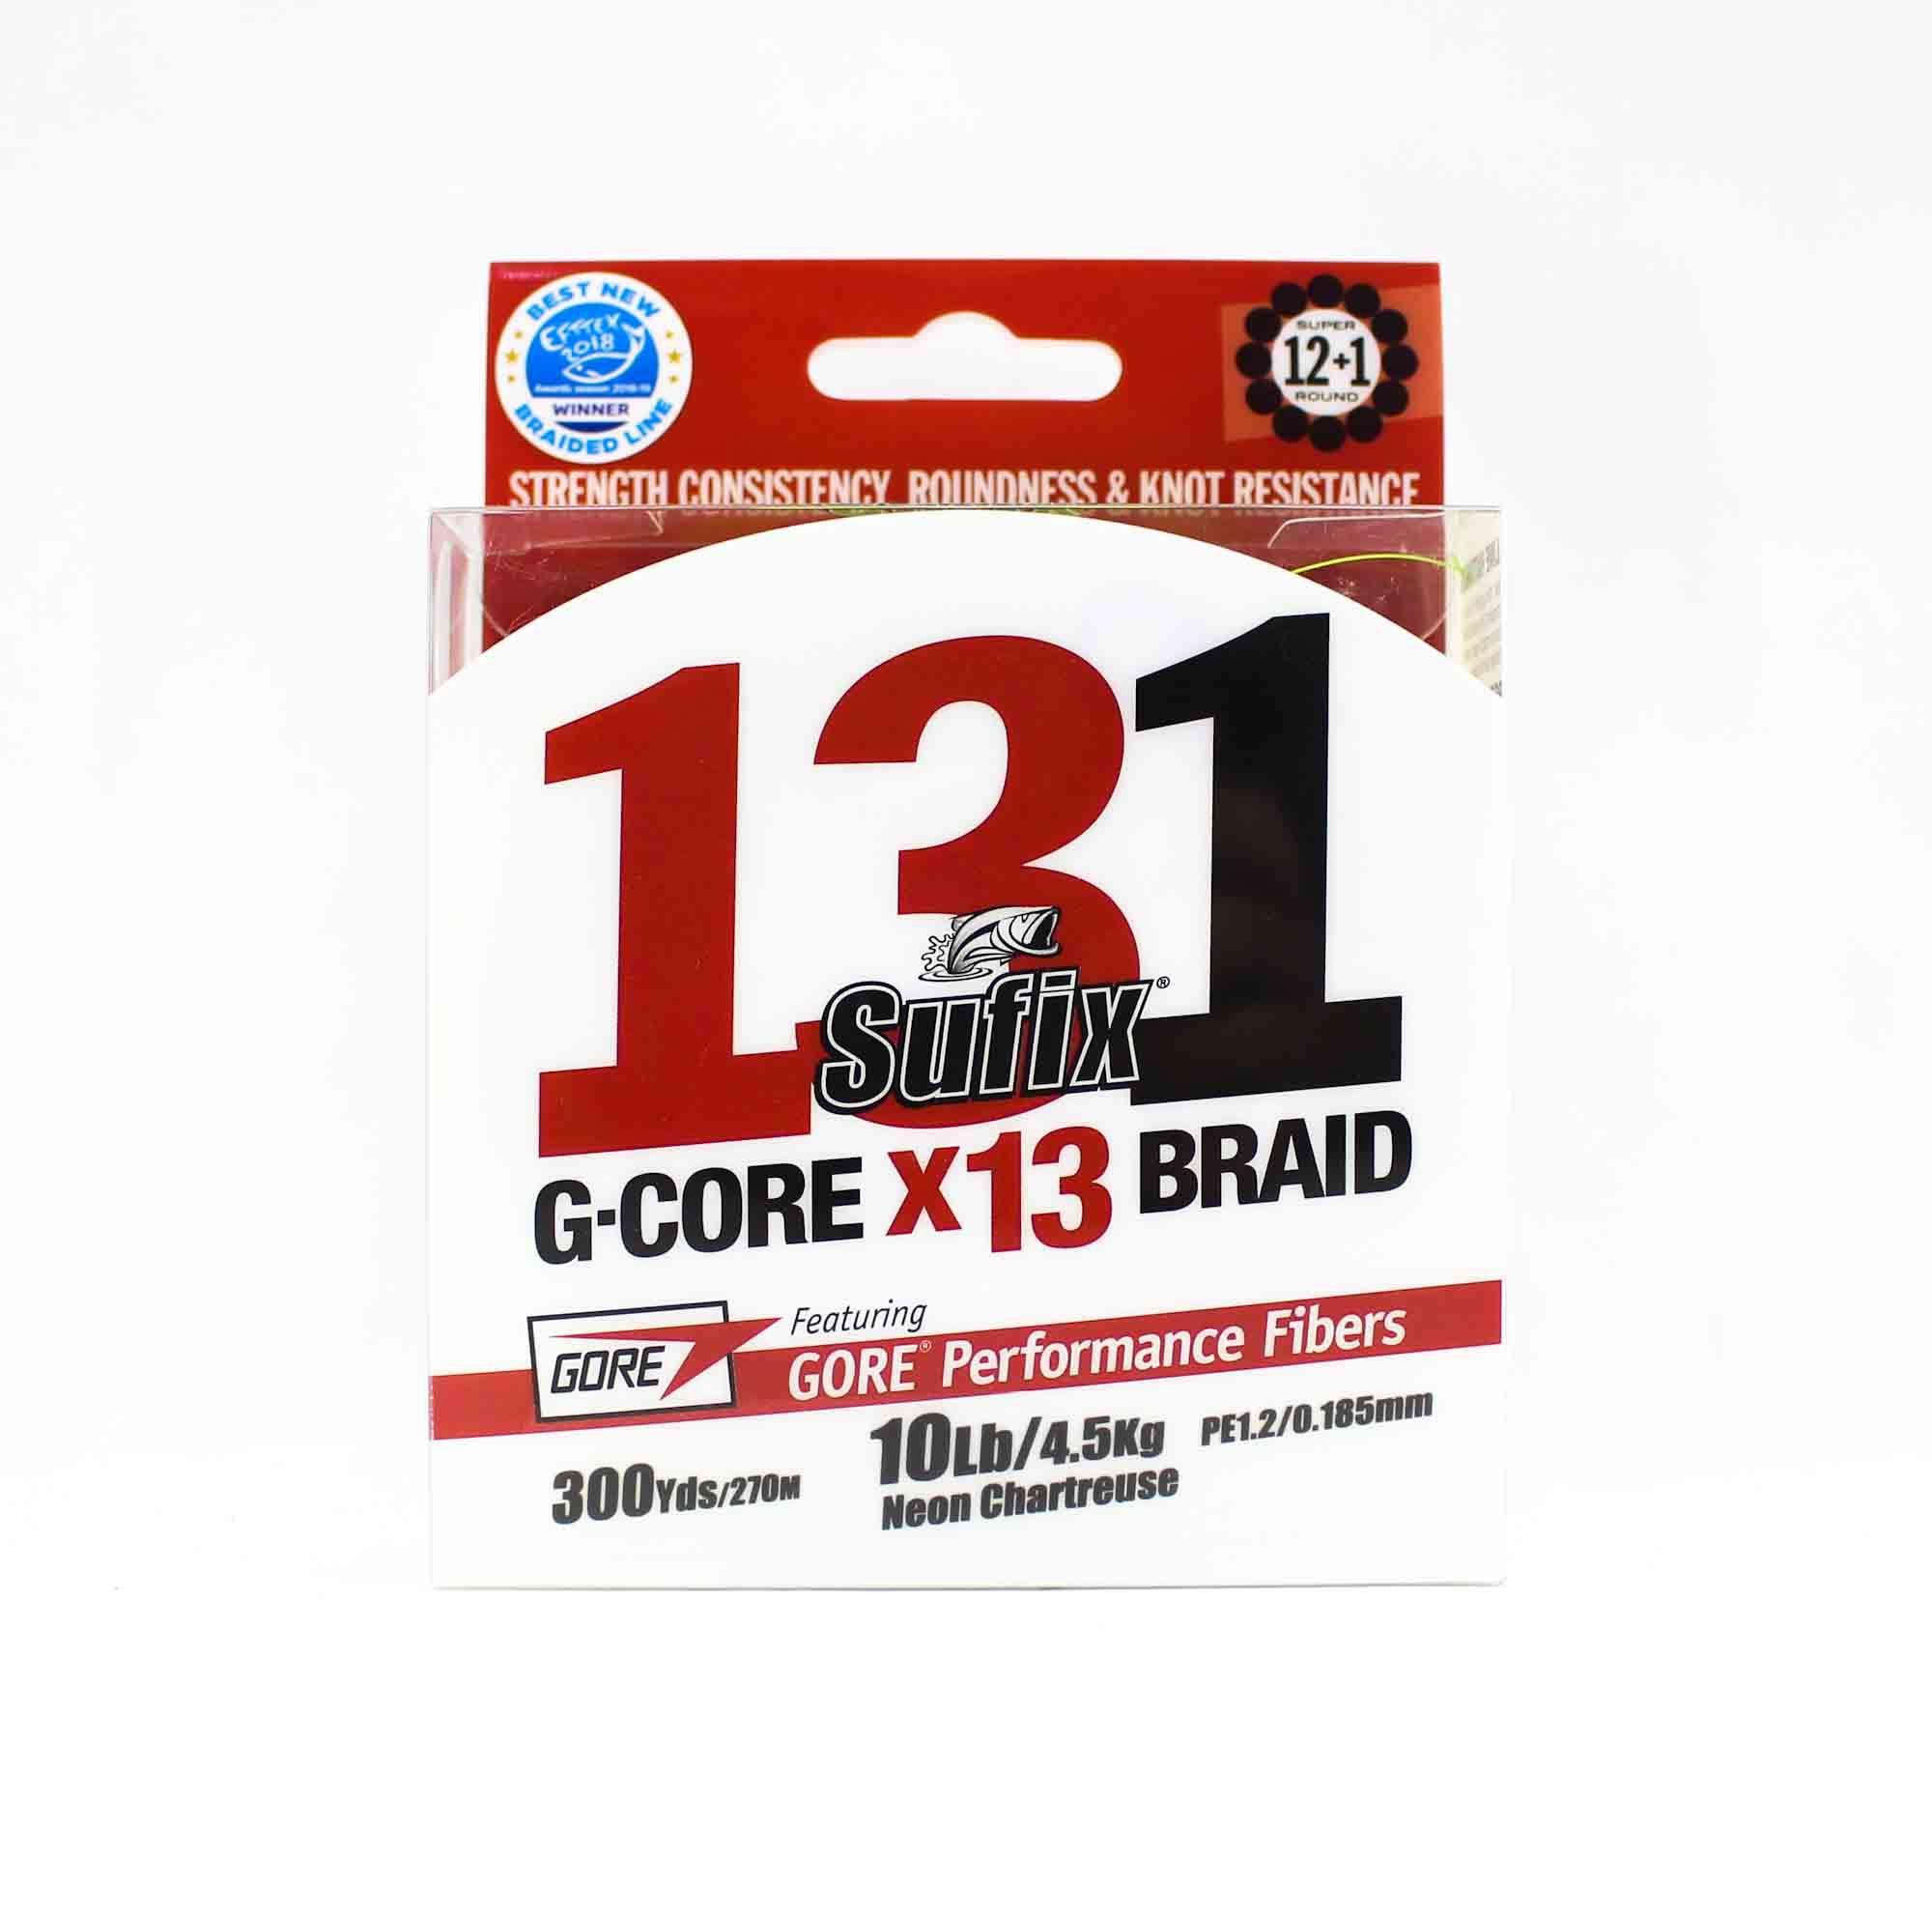 Sufix Braided 131 G-Core X13 Line 300yds 10lb Neon Chart (3918)